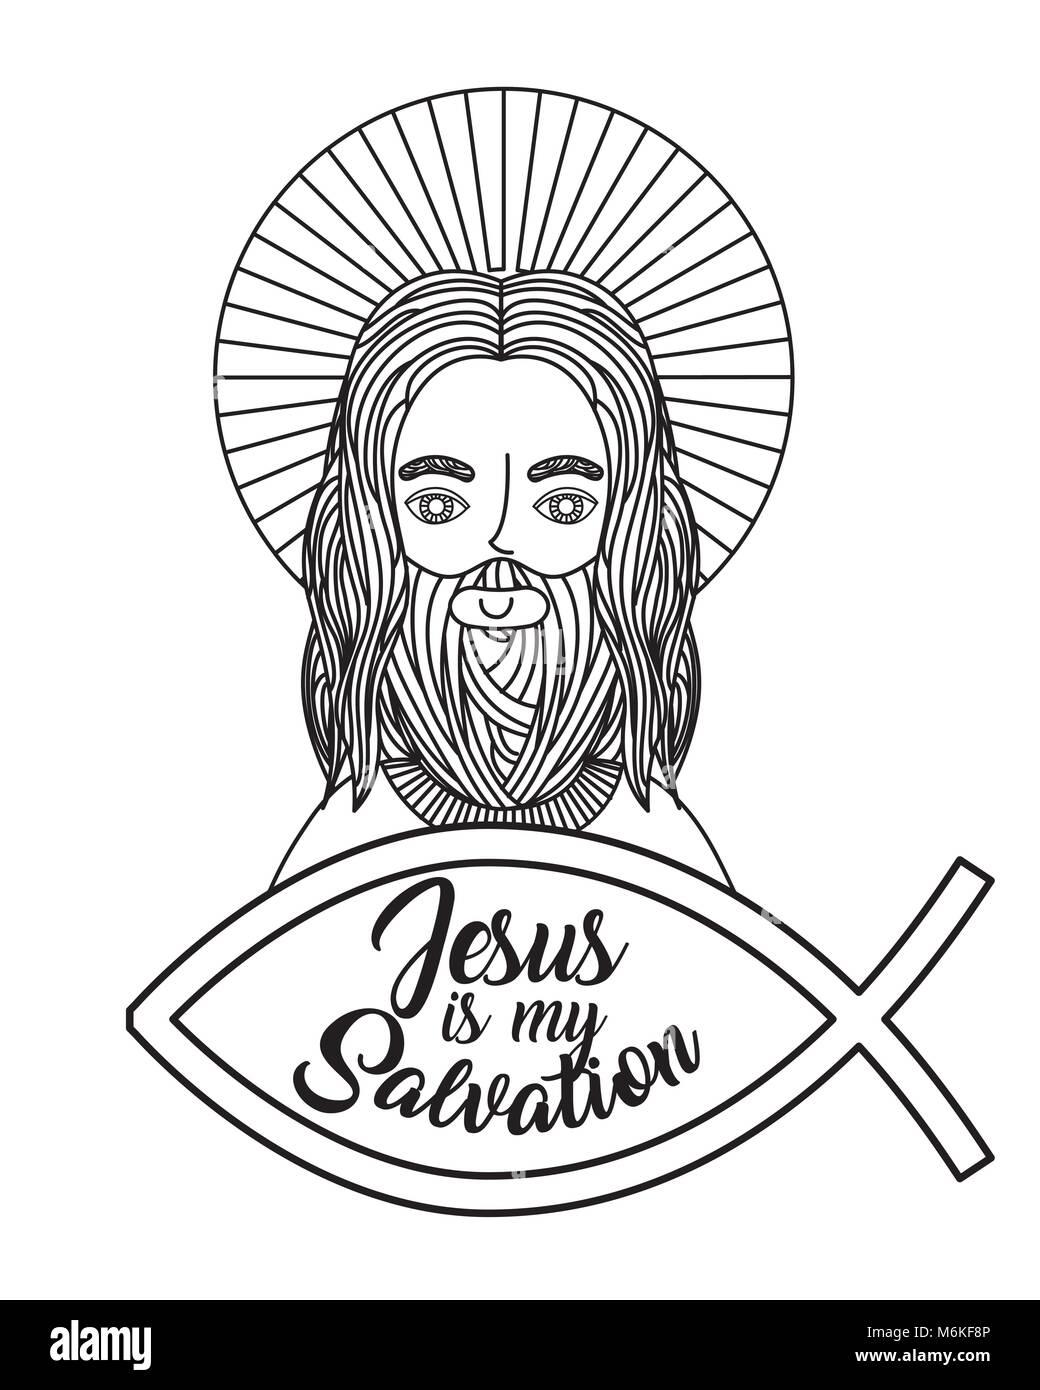 jesus catholicism religion card - Stock Vector